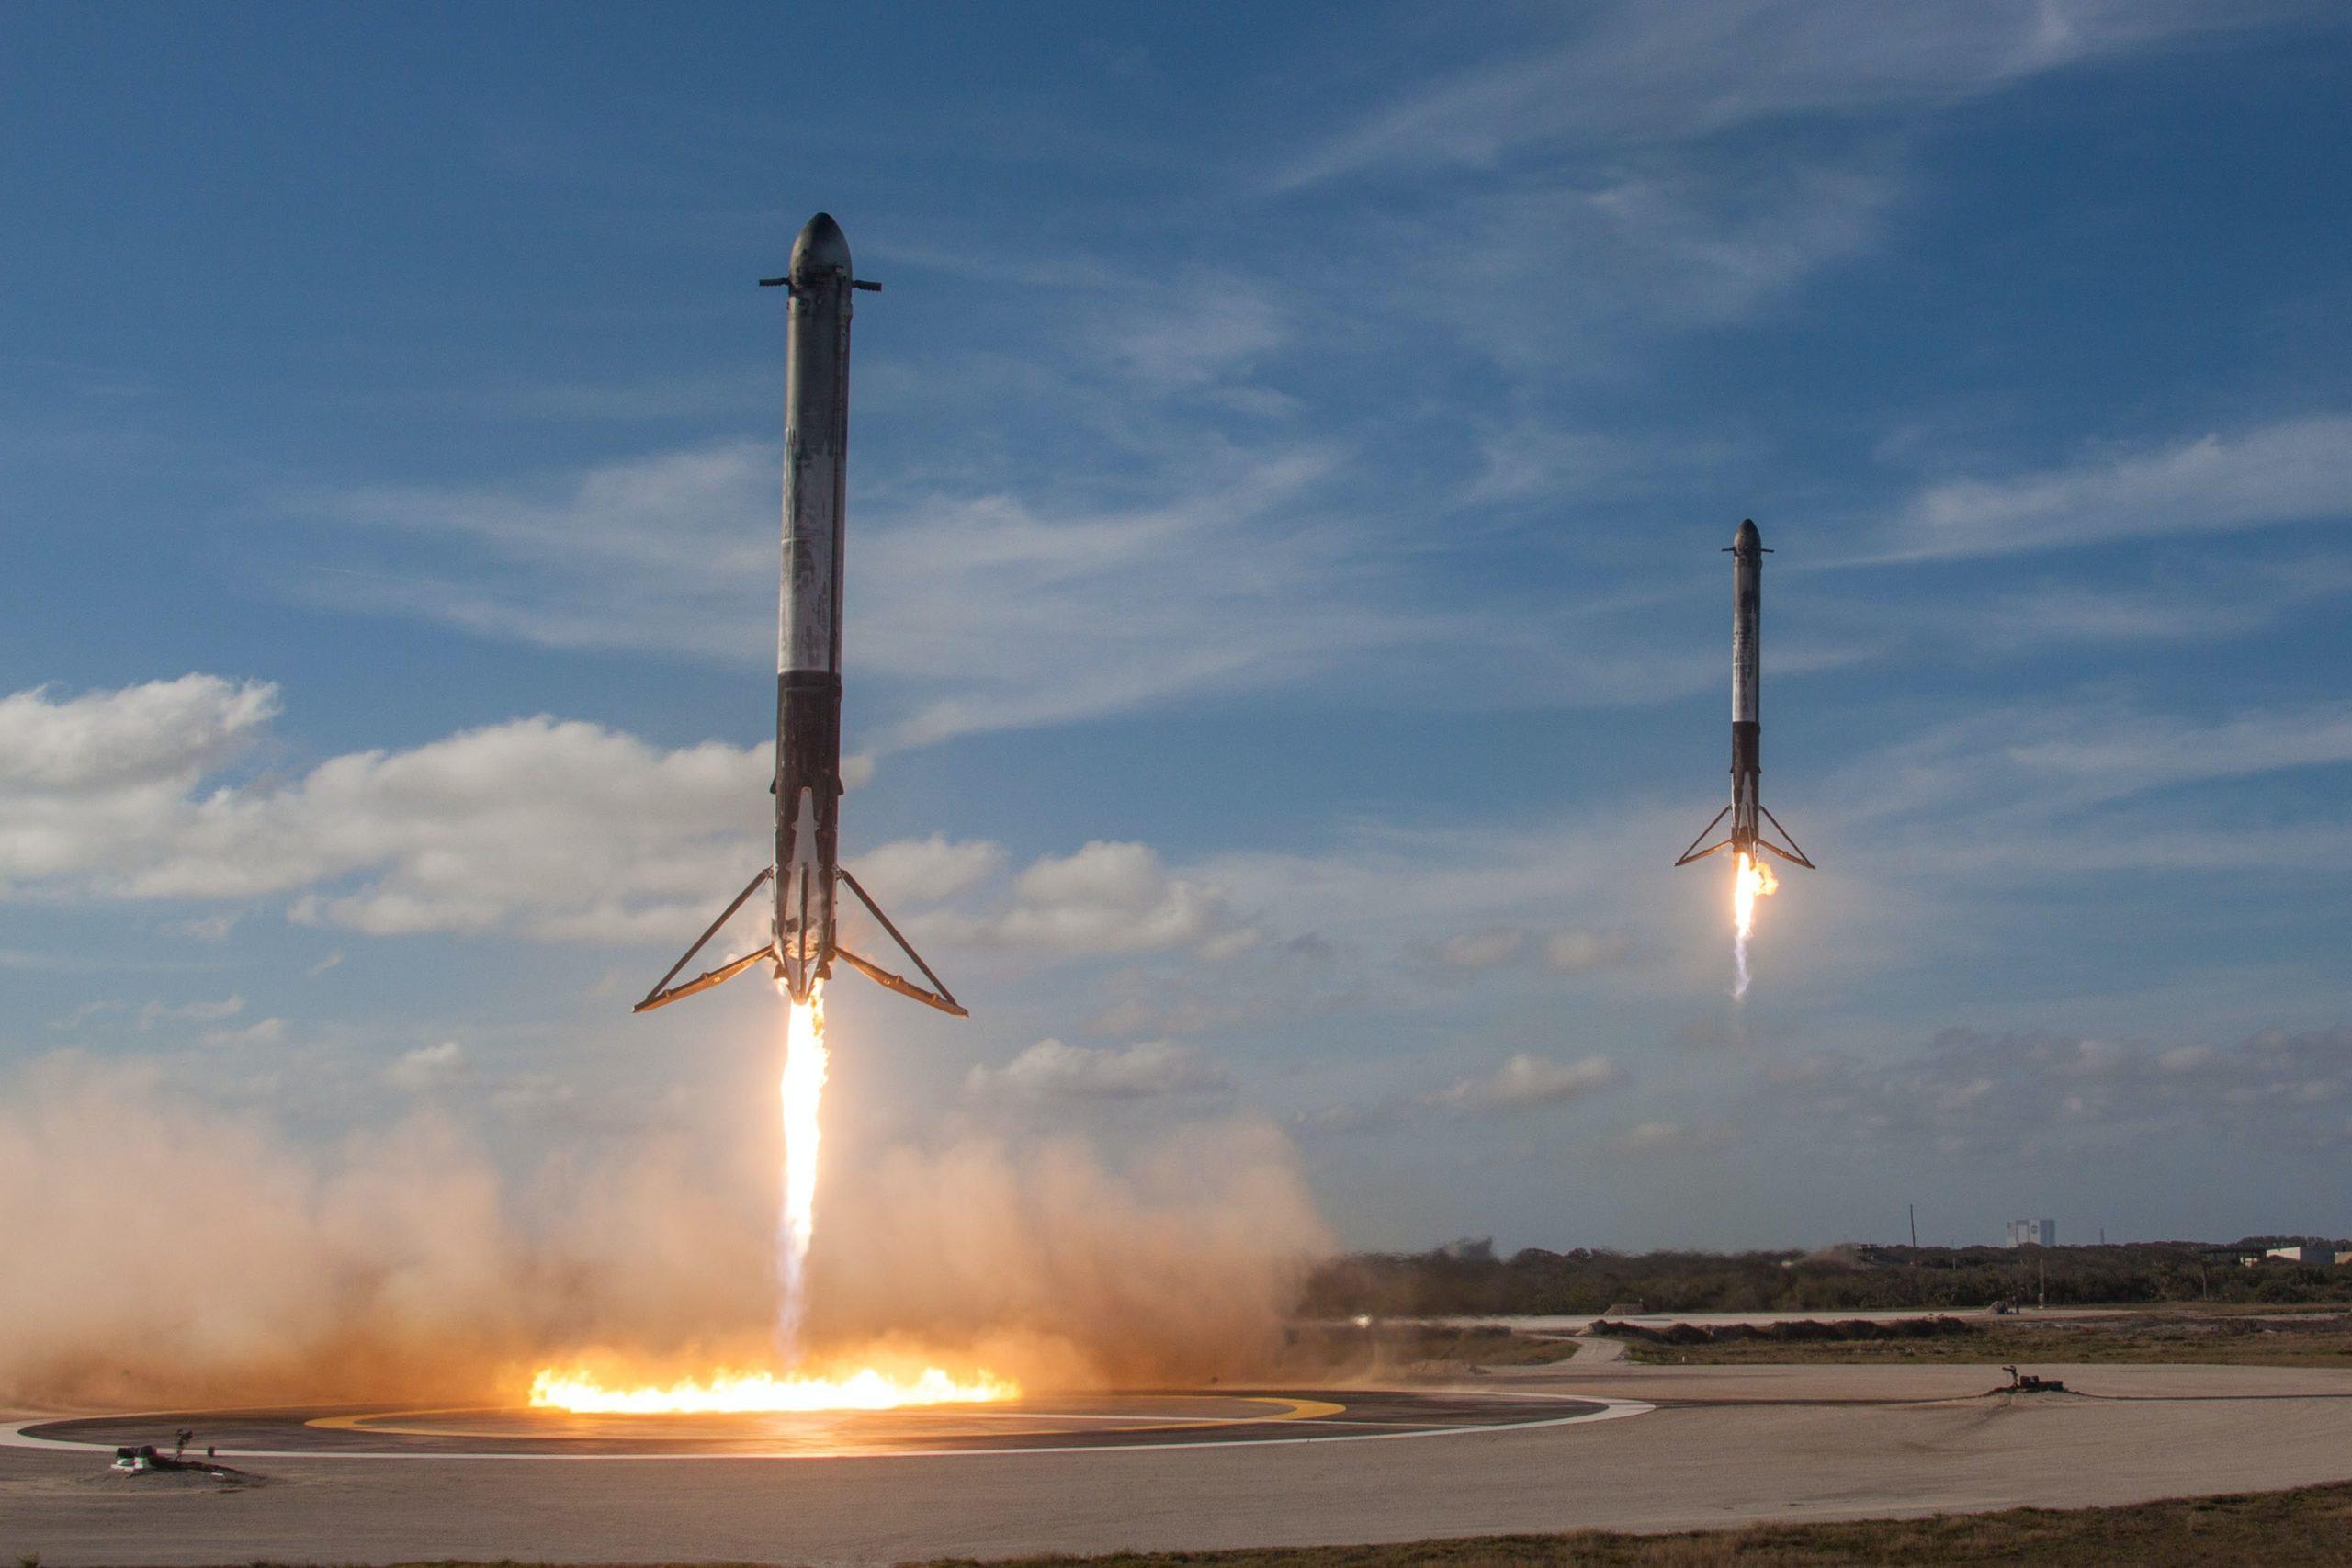 image of rocket blasting off